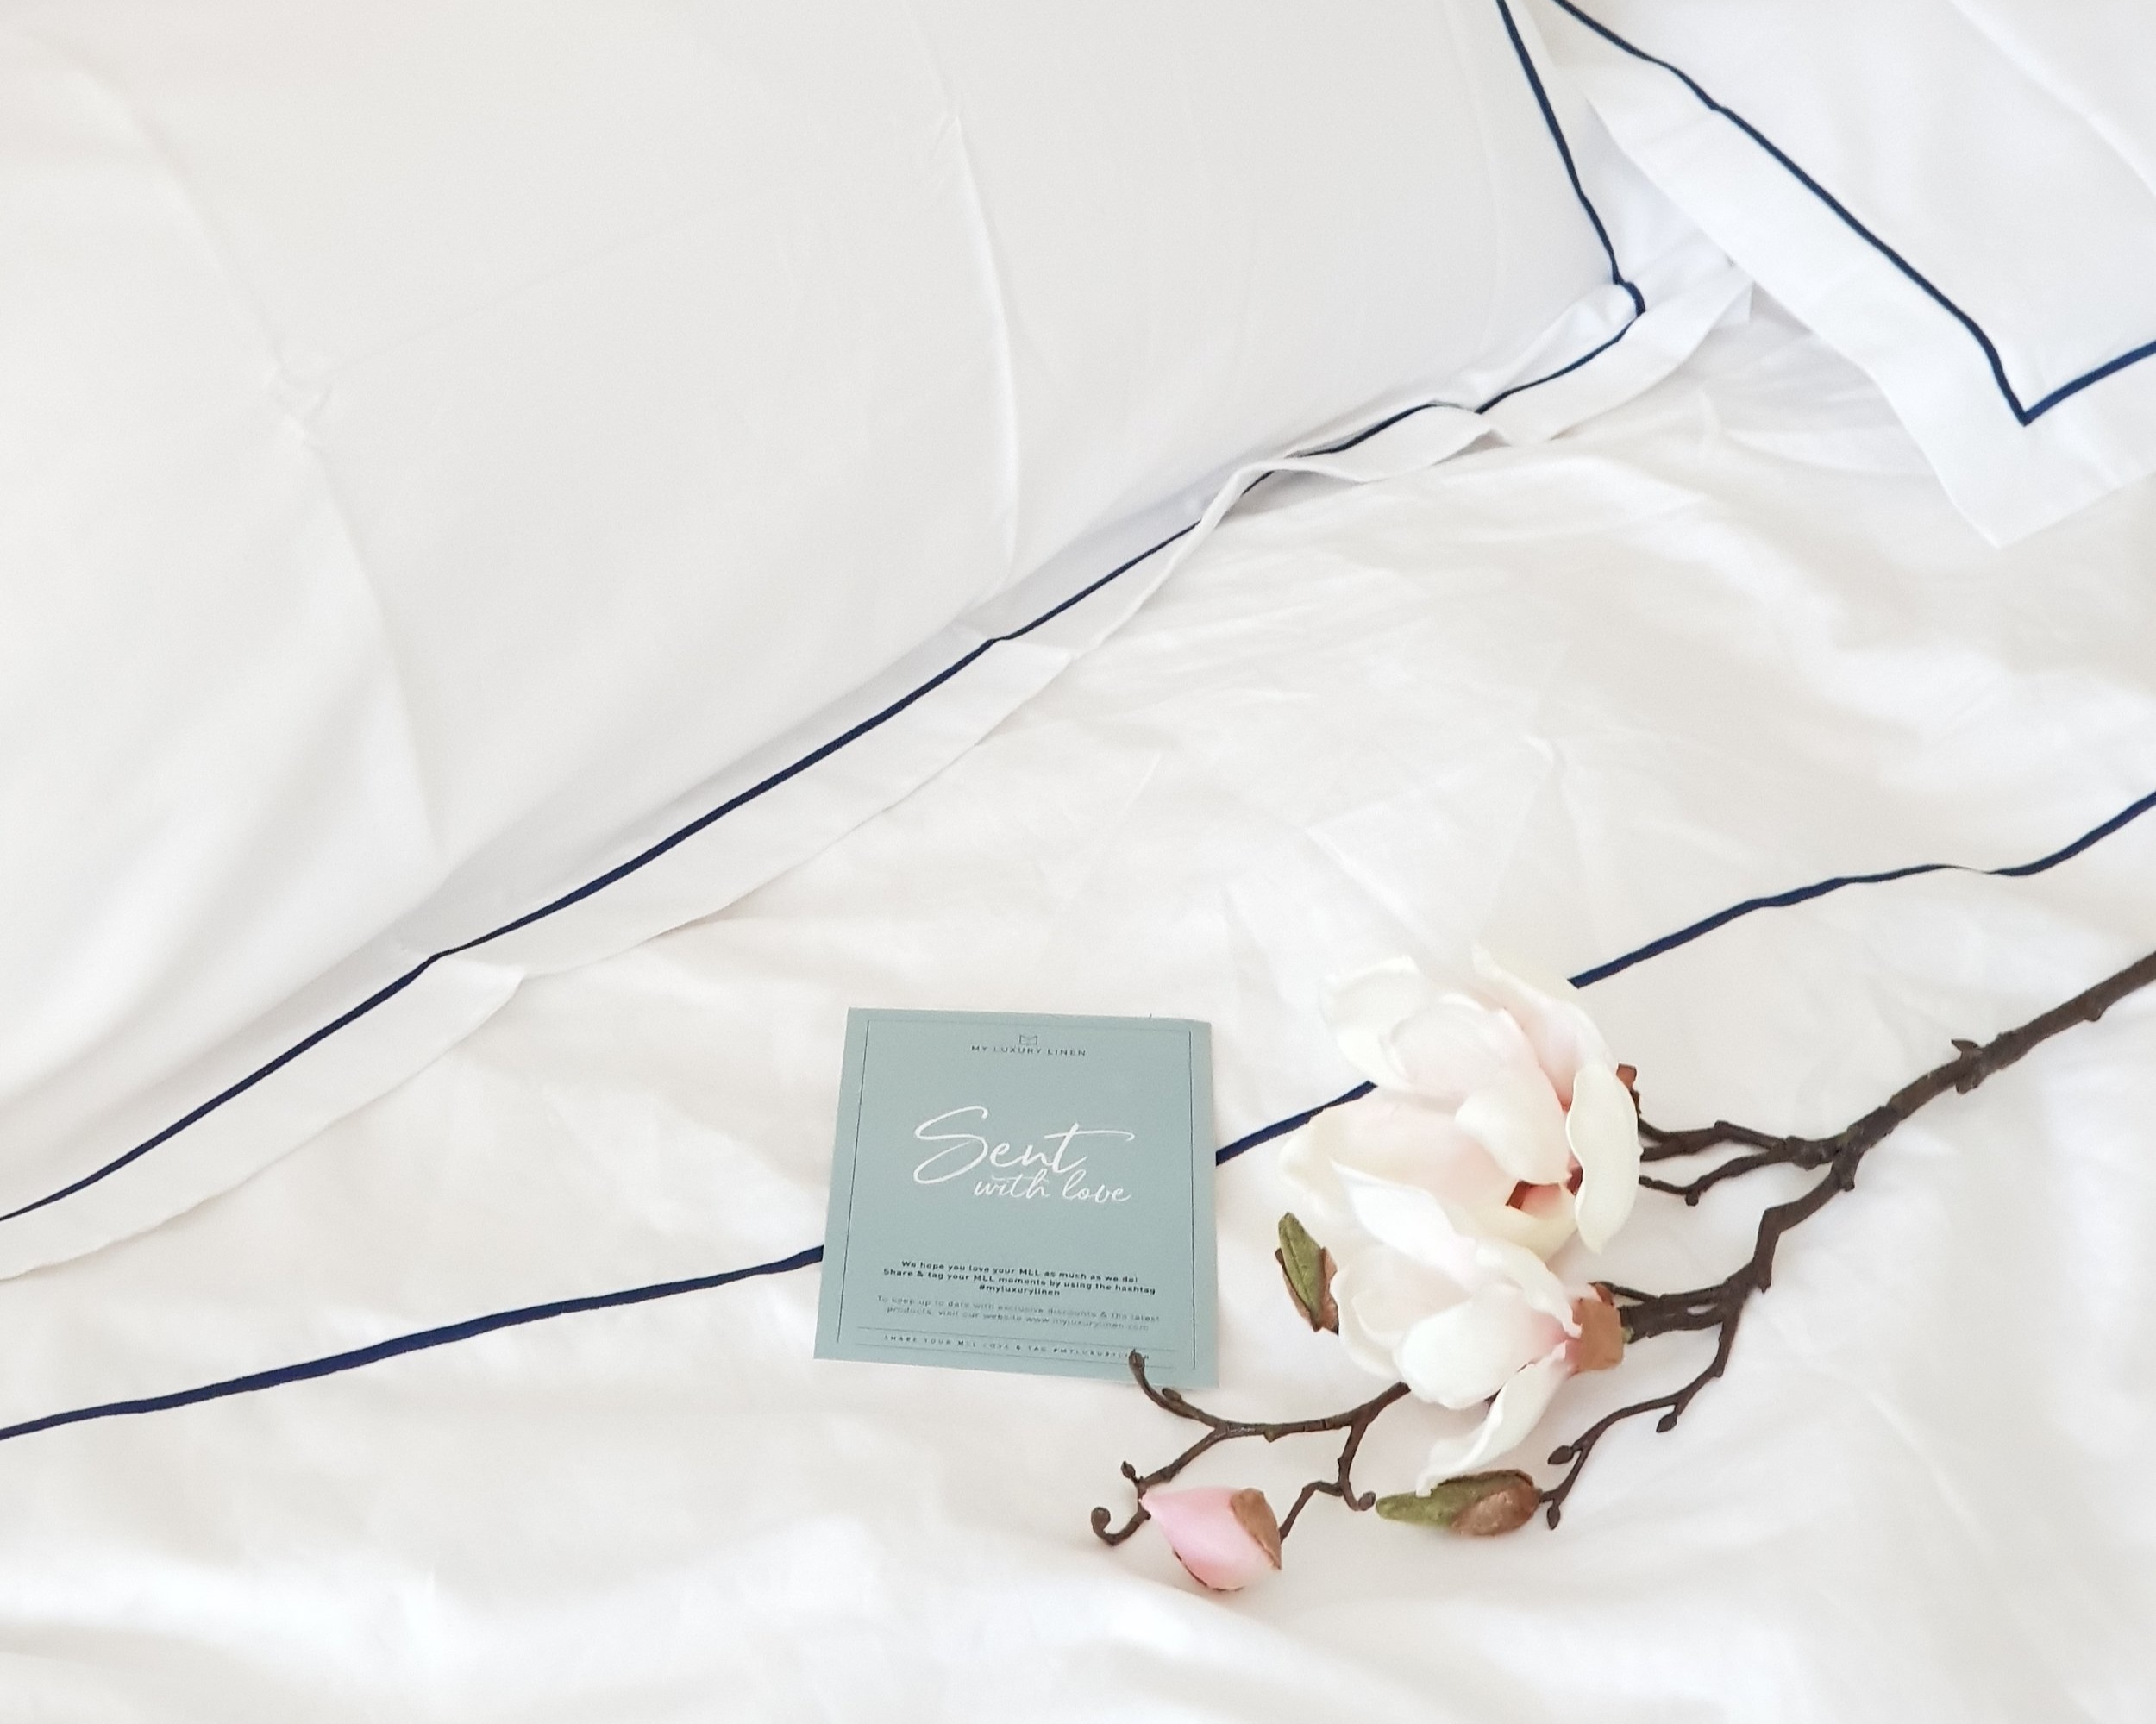 My+Luxury+Linen+Always+and+much%3B+sleep+routines+with+Sabine+.jpg